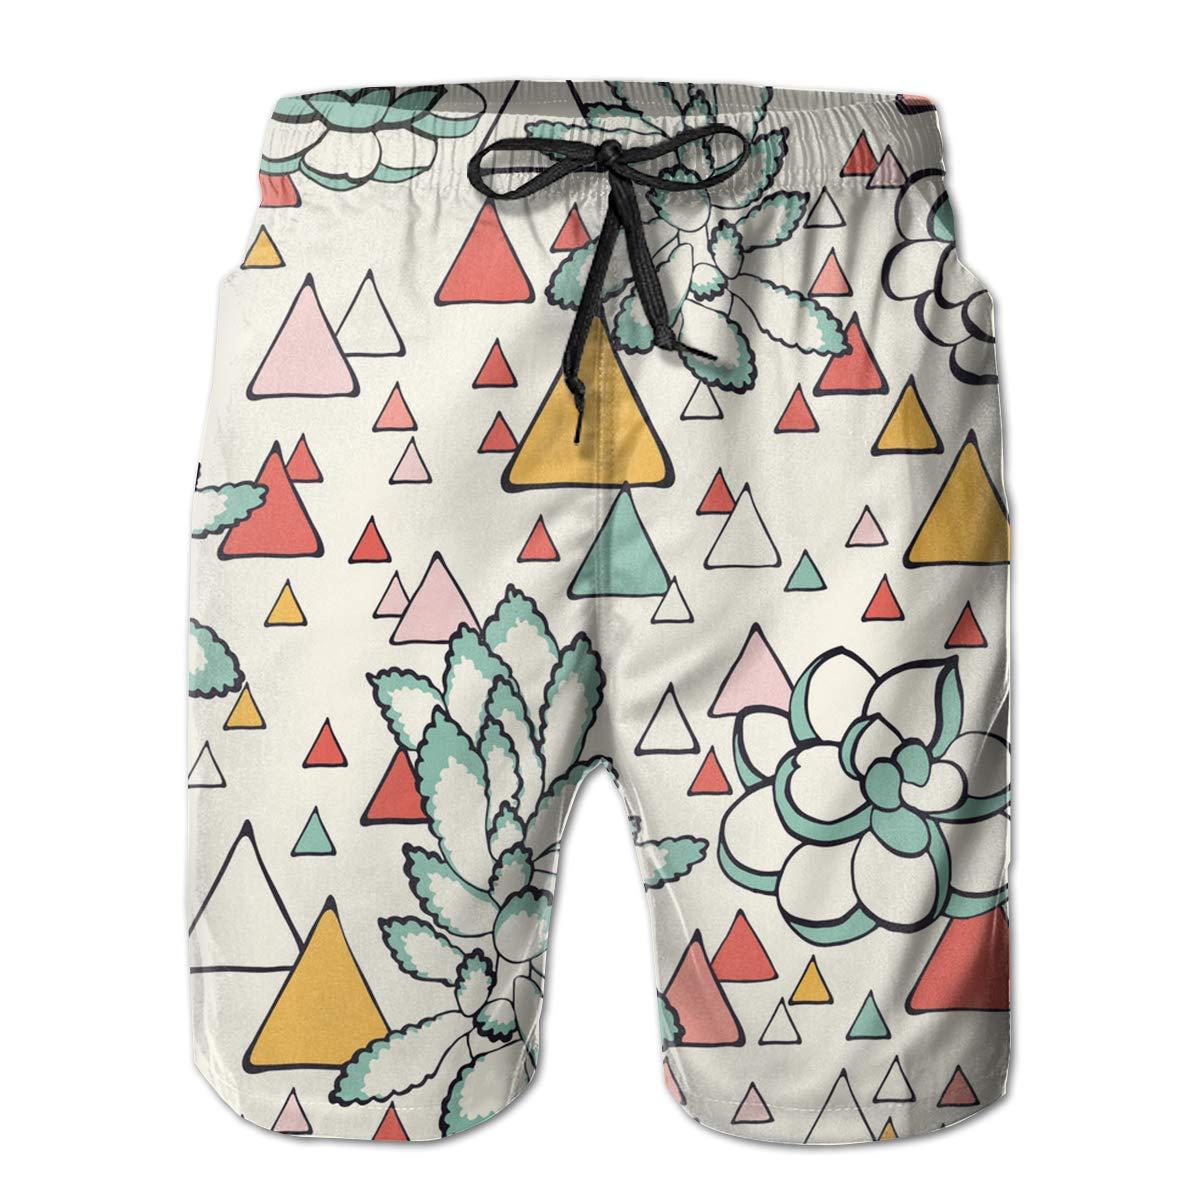 MIGAGA Mens Swim Trunks Succulent and Triangles Yellow Red Pink Surfing Beach Board Shorts Swimwear